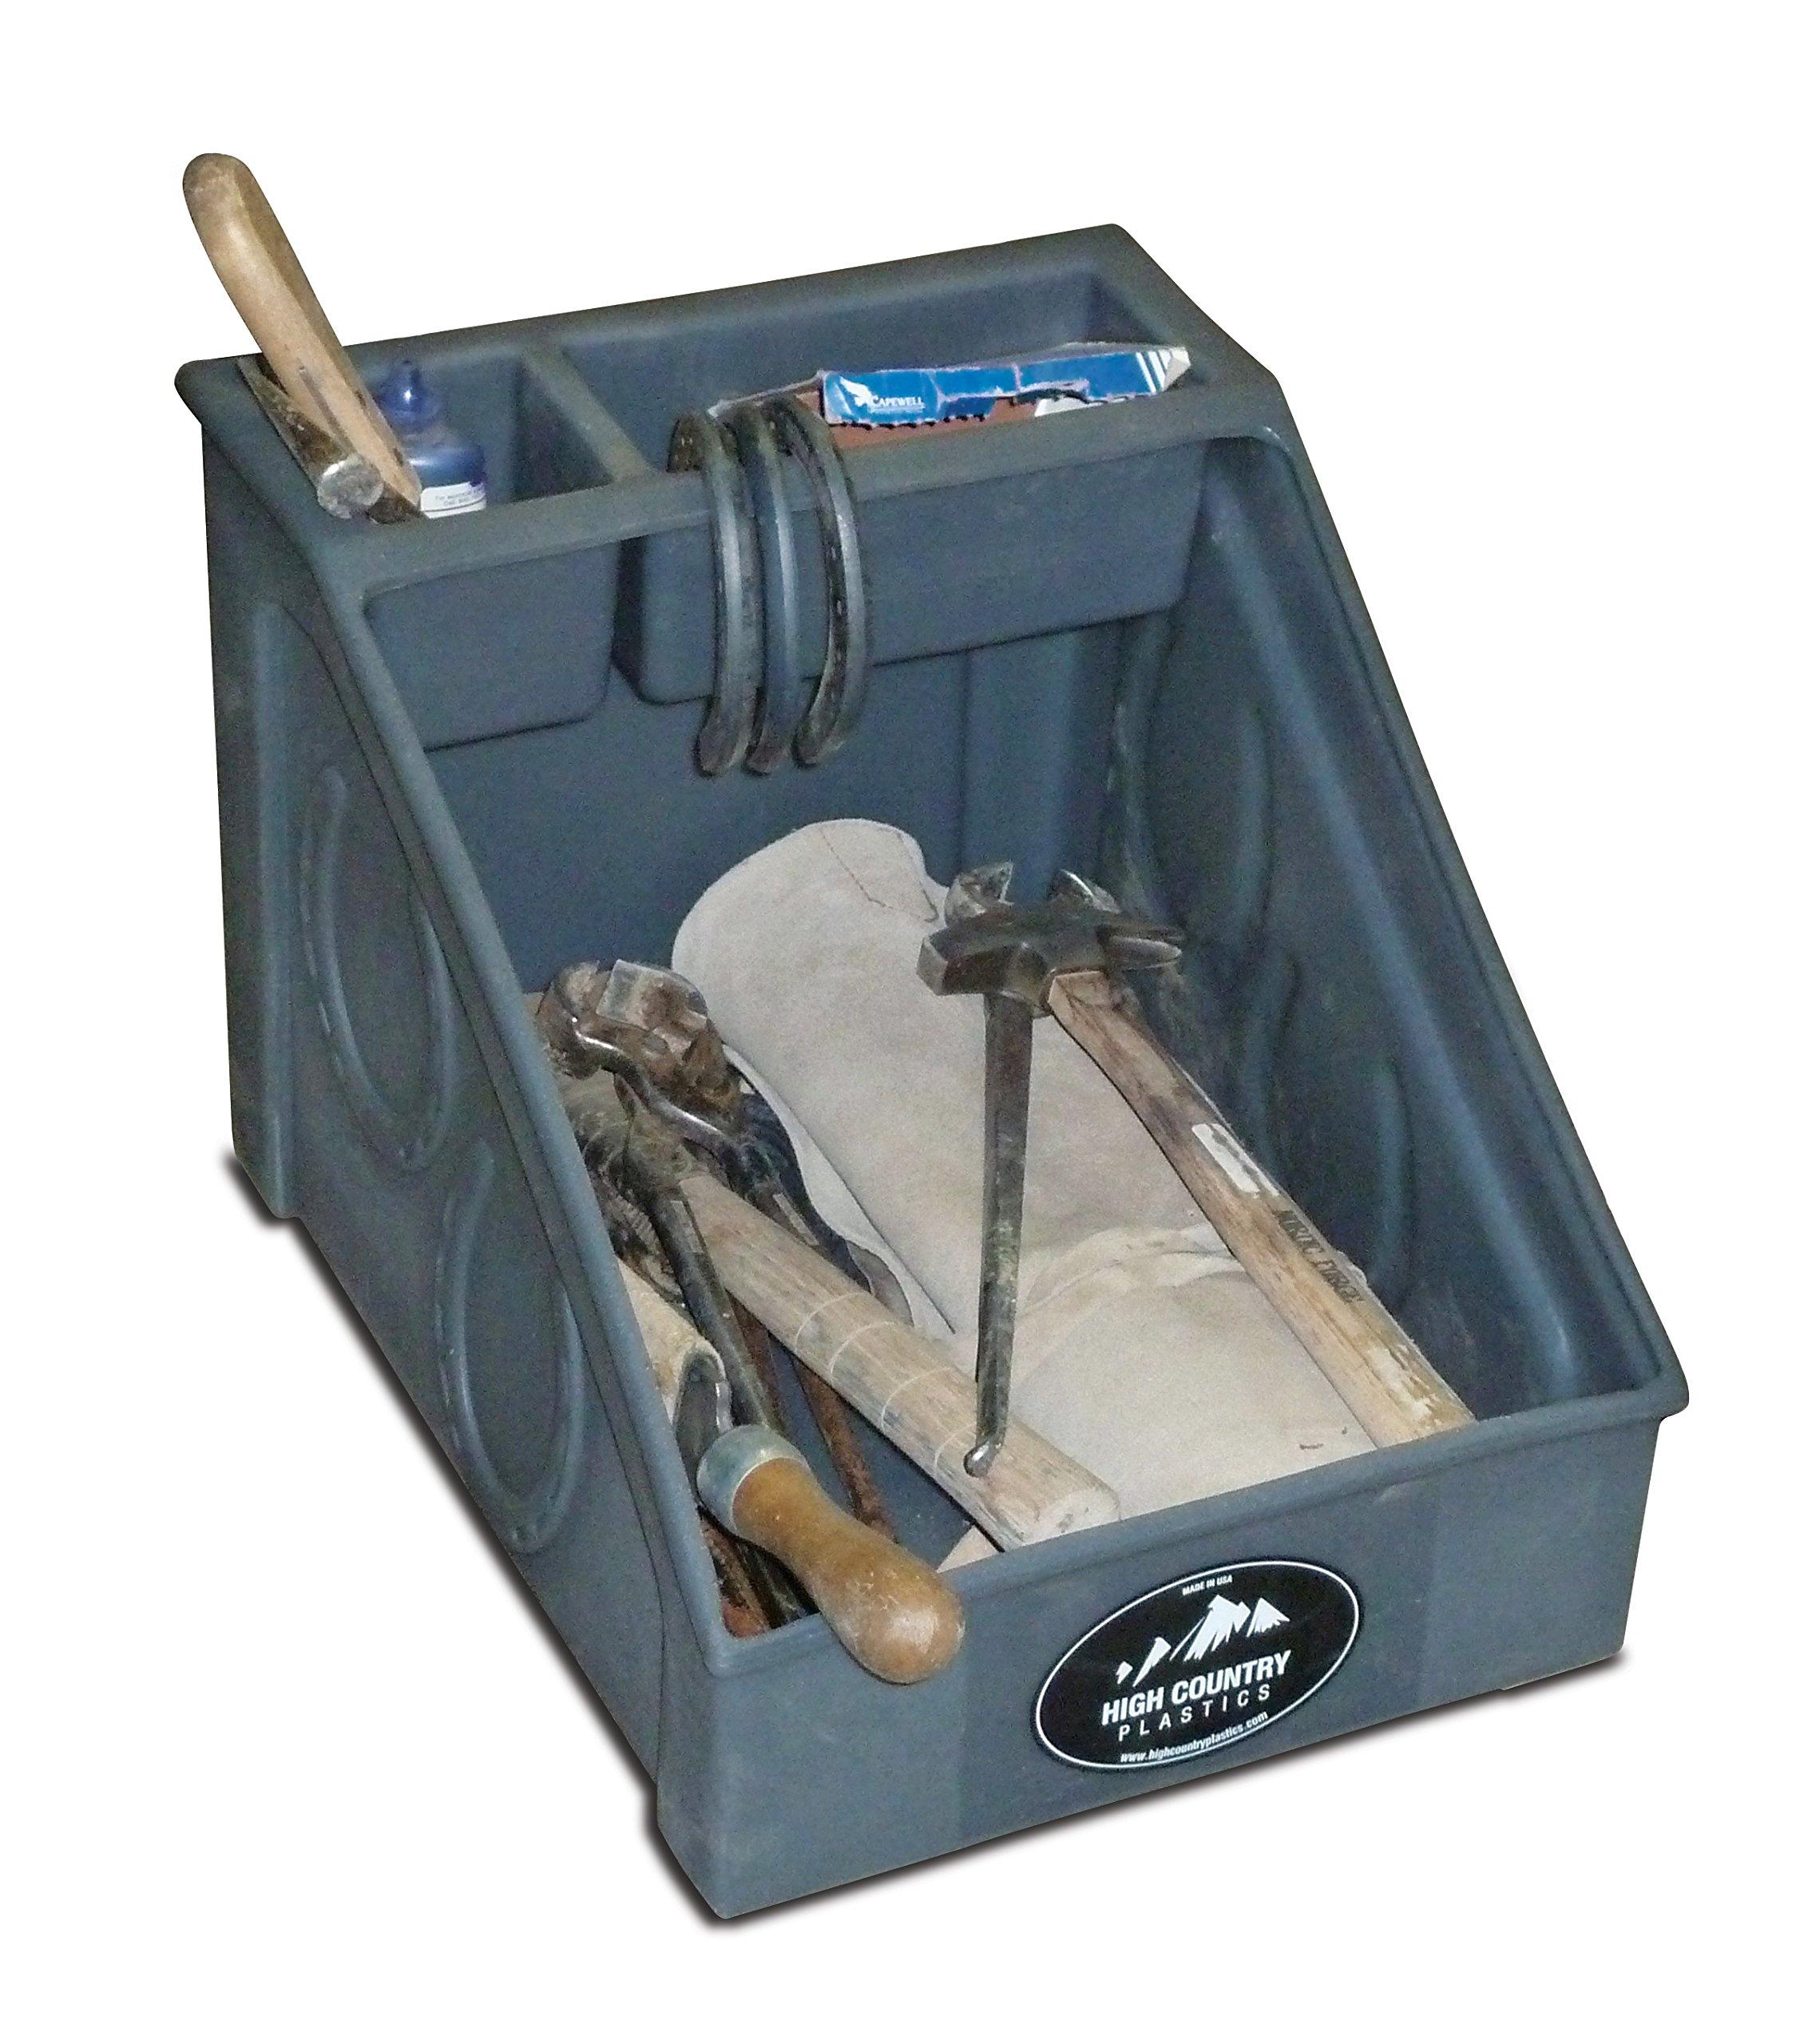 High Country Plastics Farrier Box - Maintenance Box